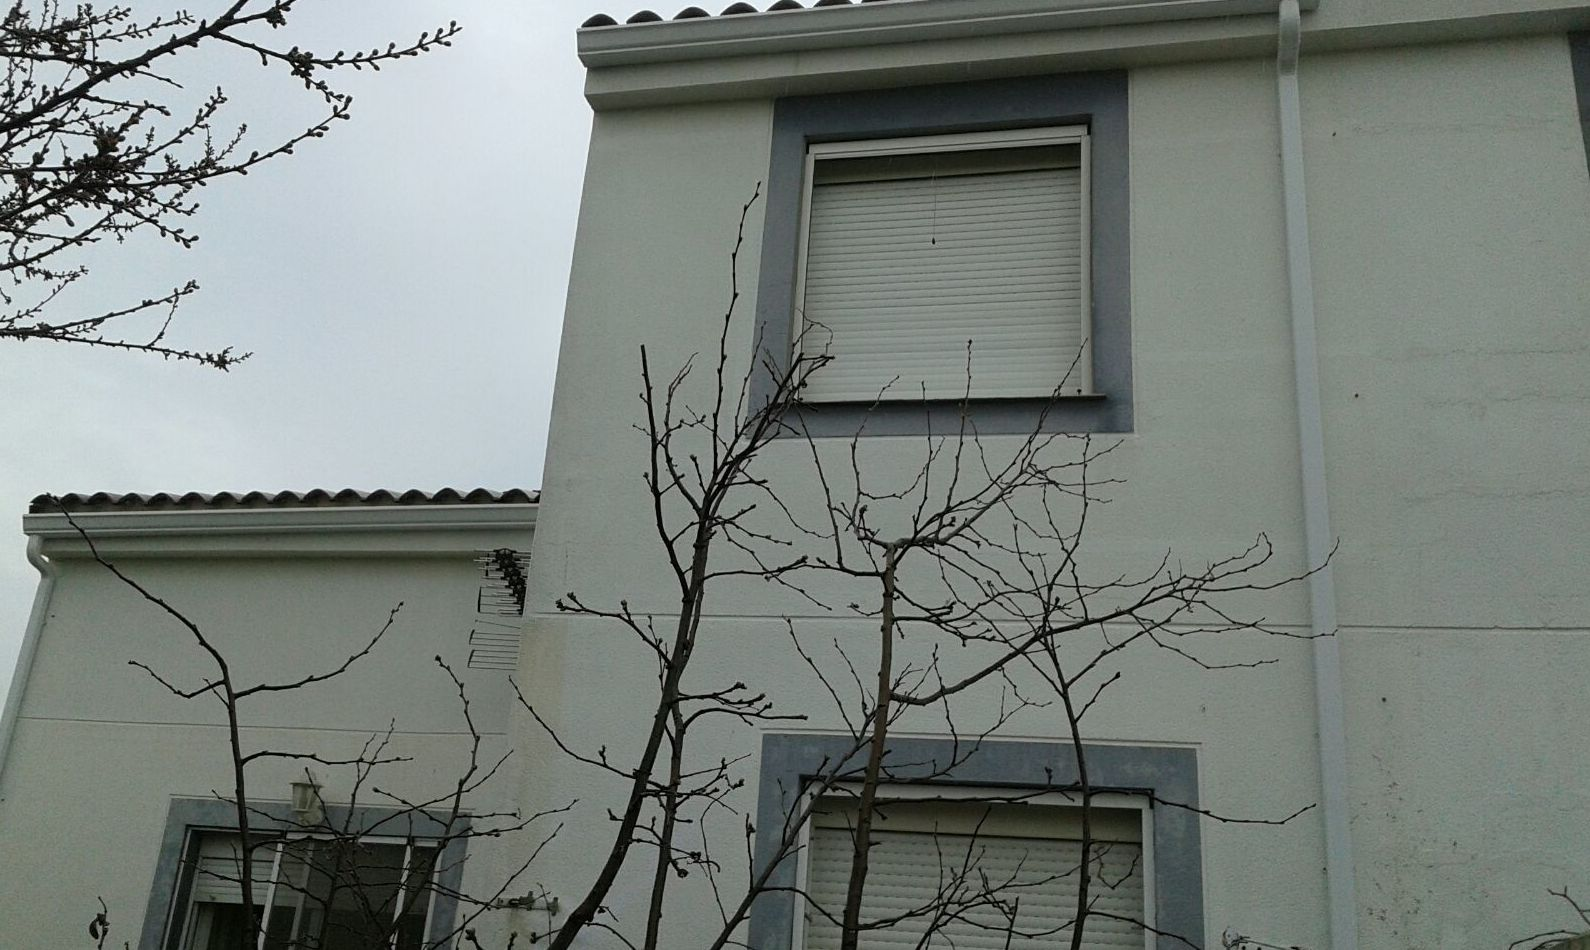 Bajante de agua en fachada